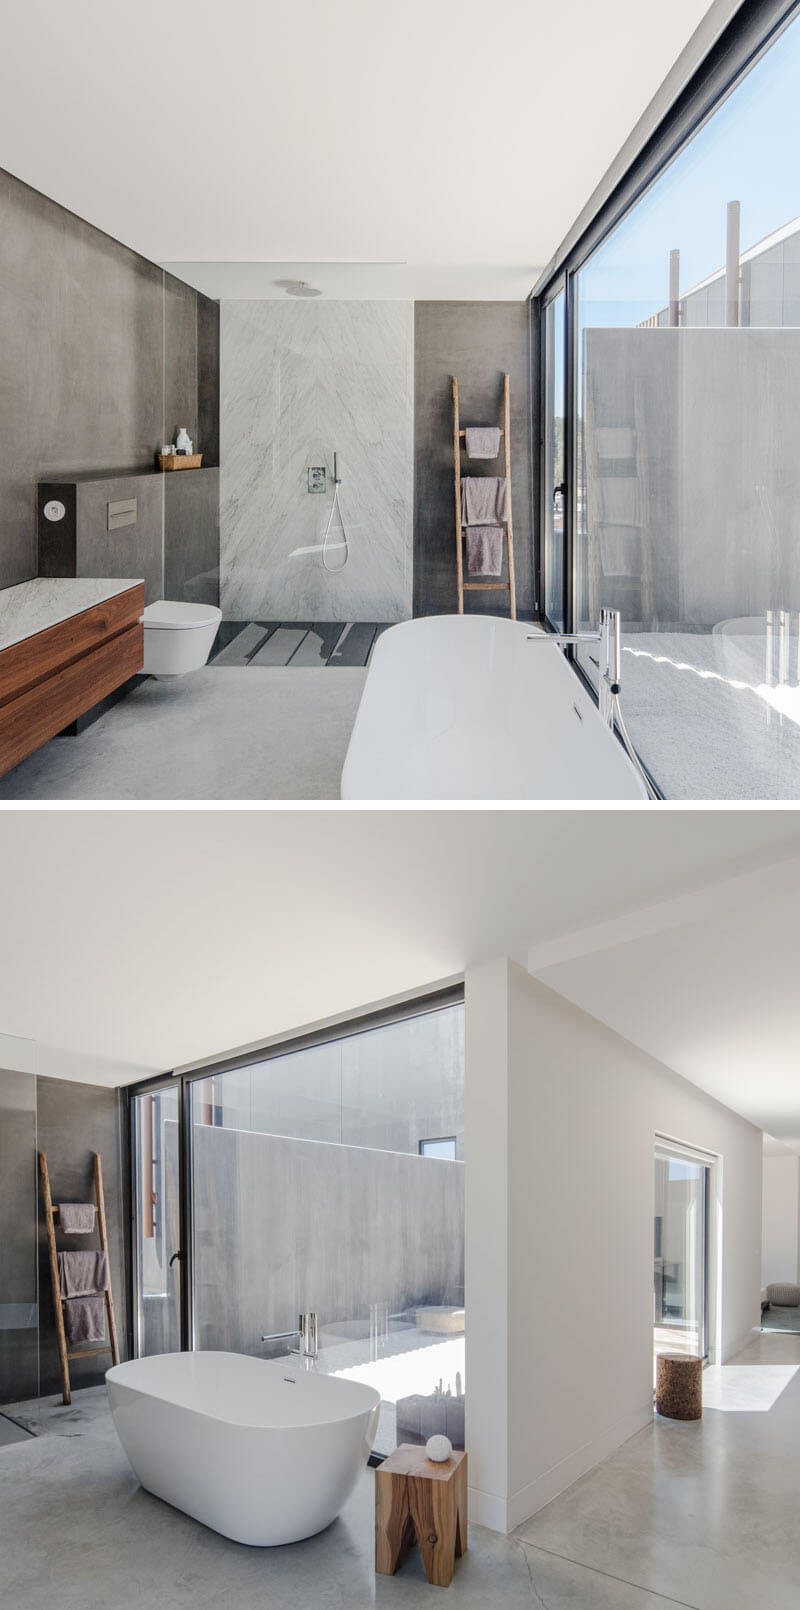 casa banho minimalista arquitetura portugal